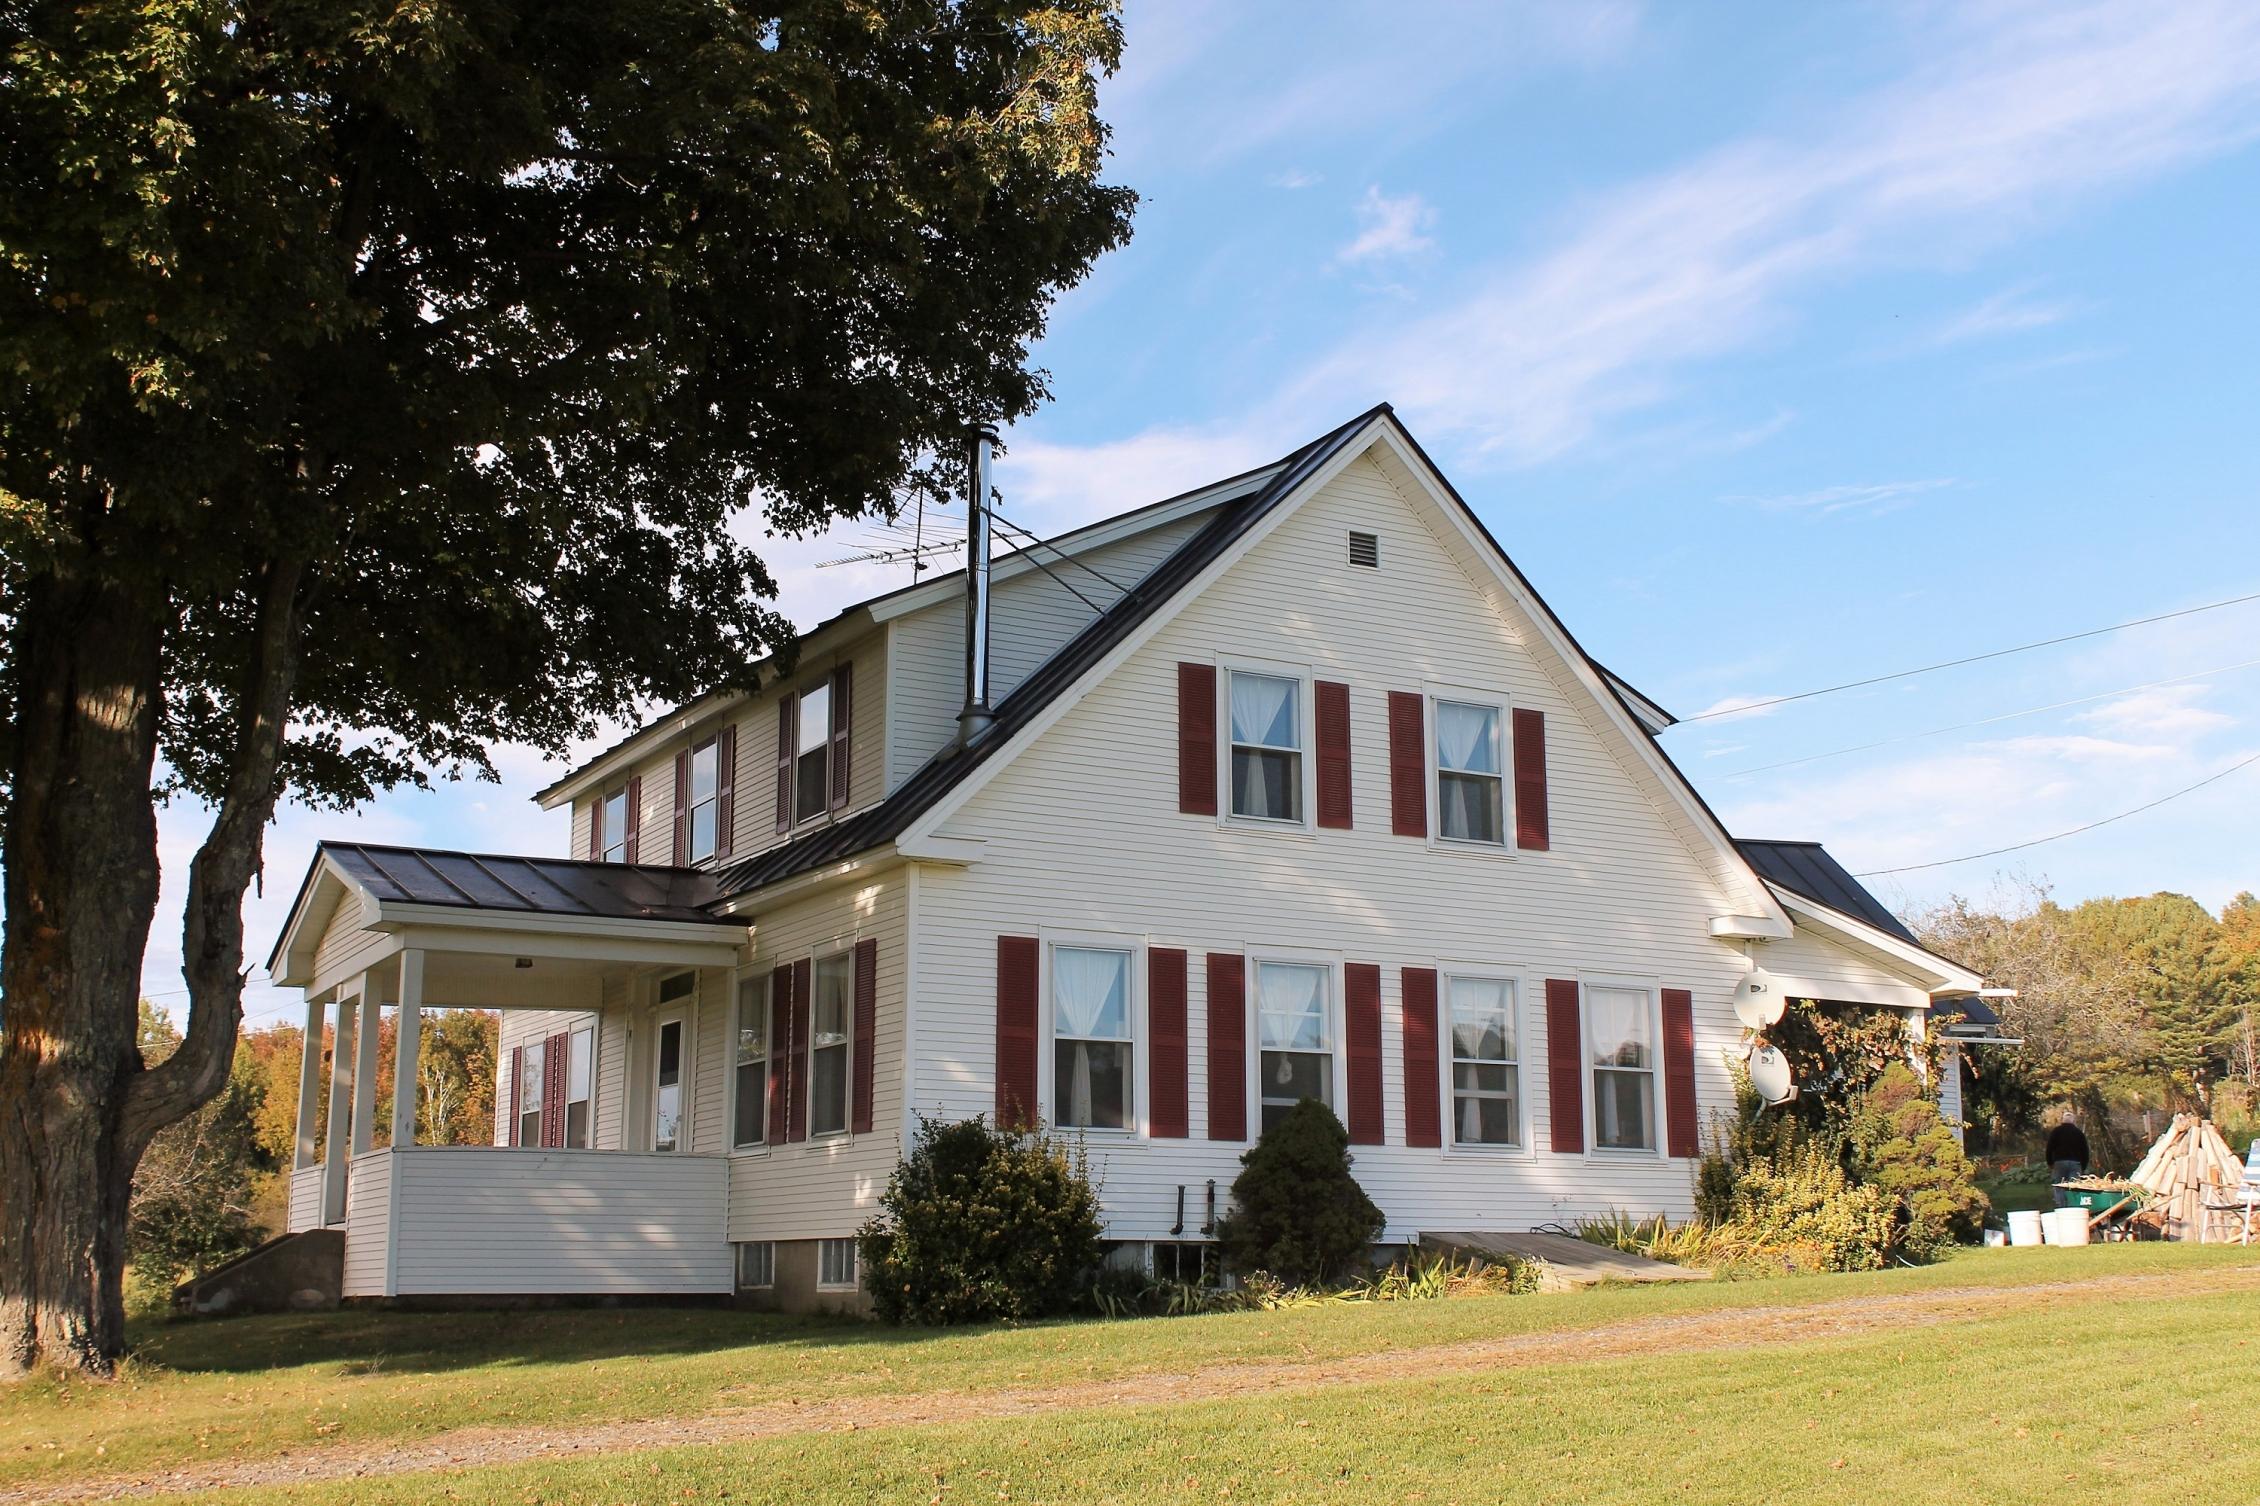 独户住宅 为 销售 在 1581 Fish Hill Road, Randolph 1581 Fish Hill Rd Randolph, 佛蒙特州 05060 美国